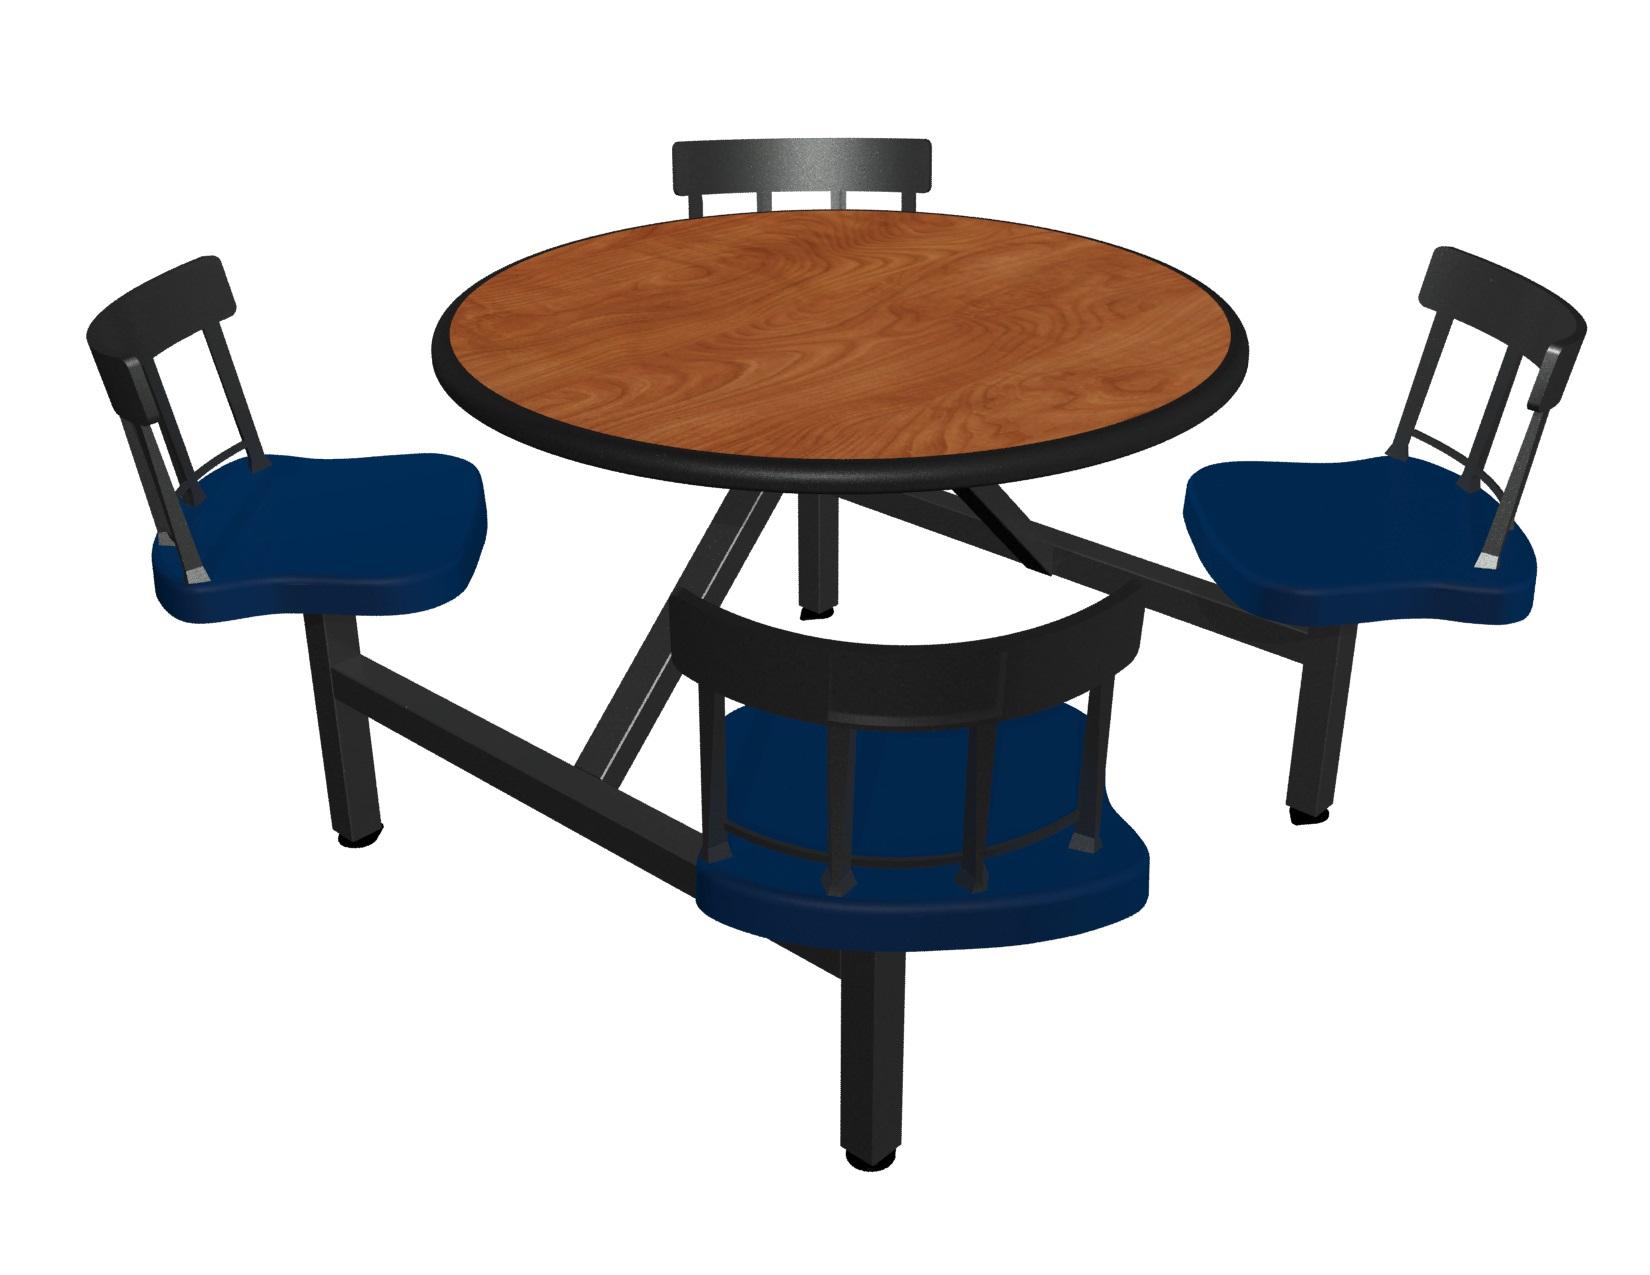 Restaurant Furniture Manufacturers Usa : Millennium seating usa restaurant furniture and